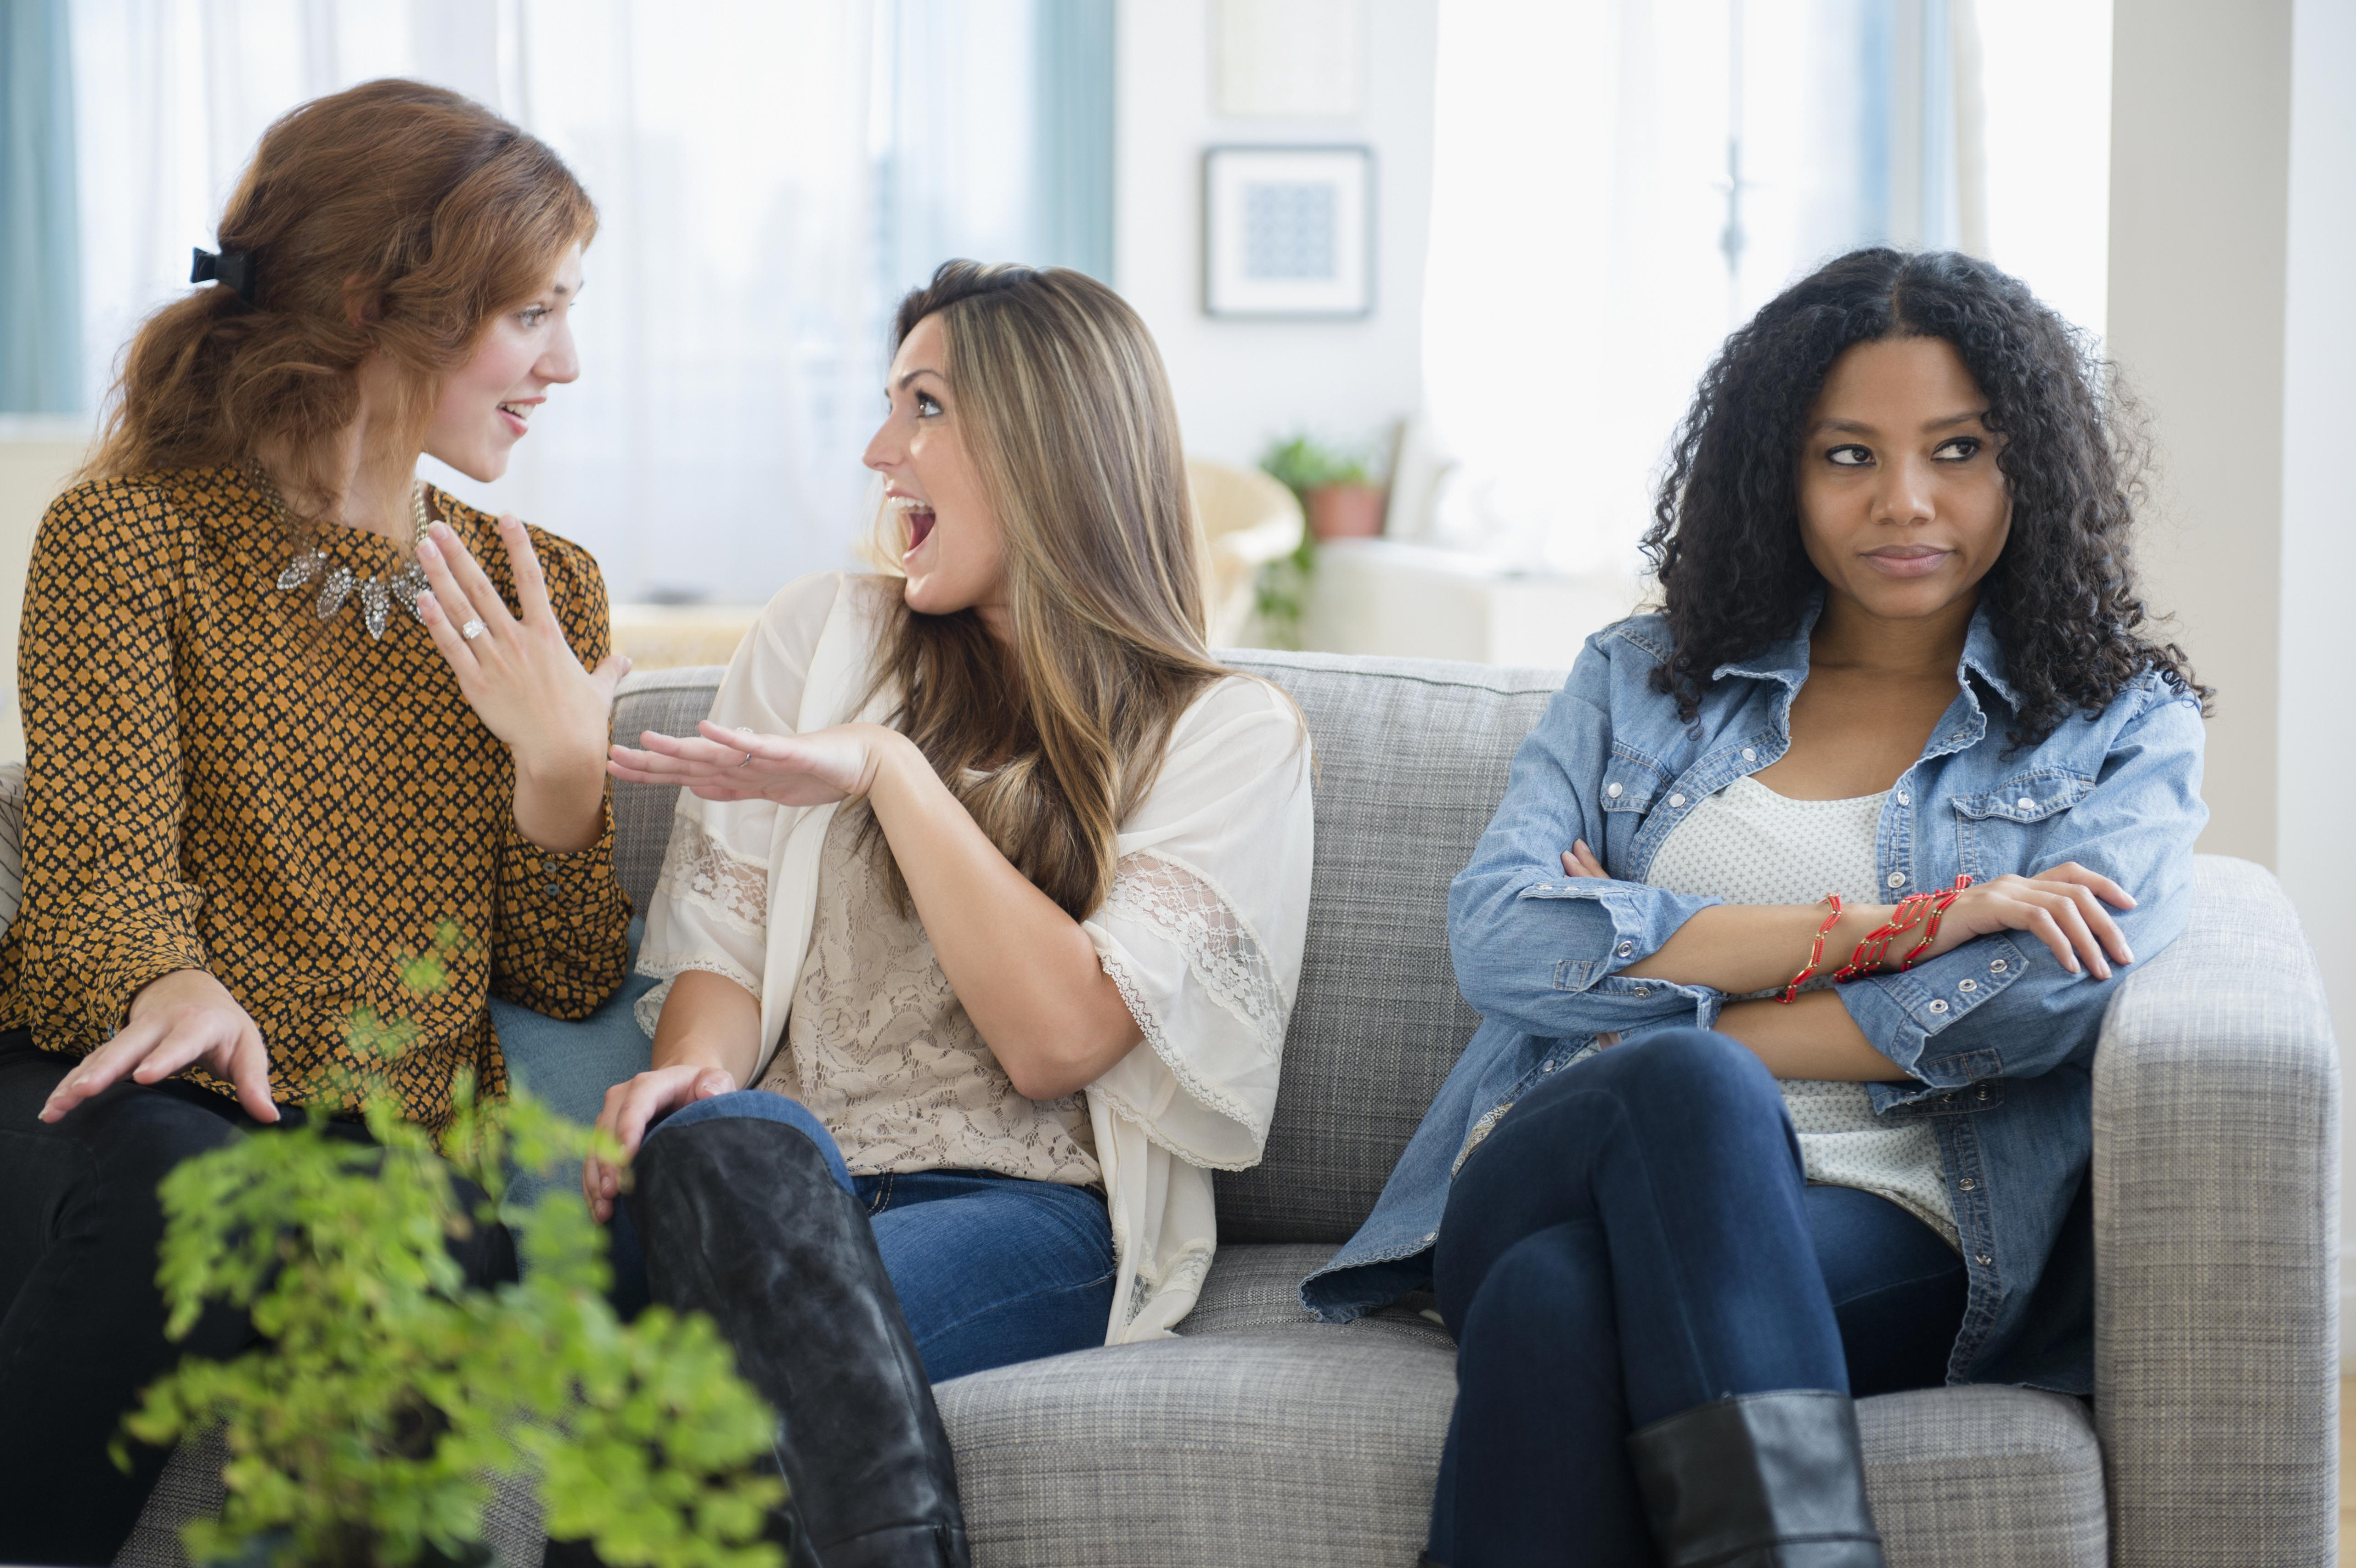 Chatting women ignoring upset friend on sofa